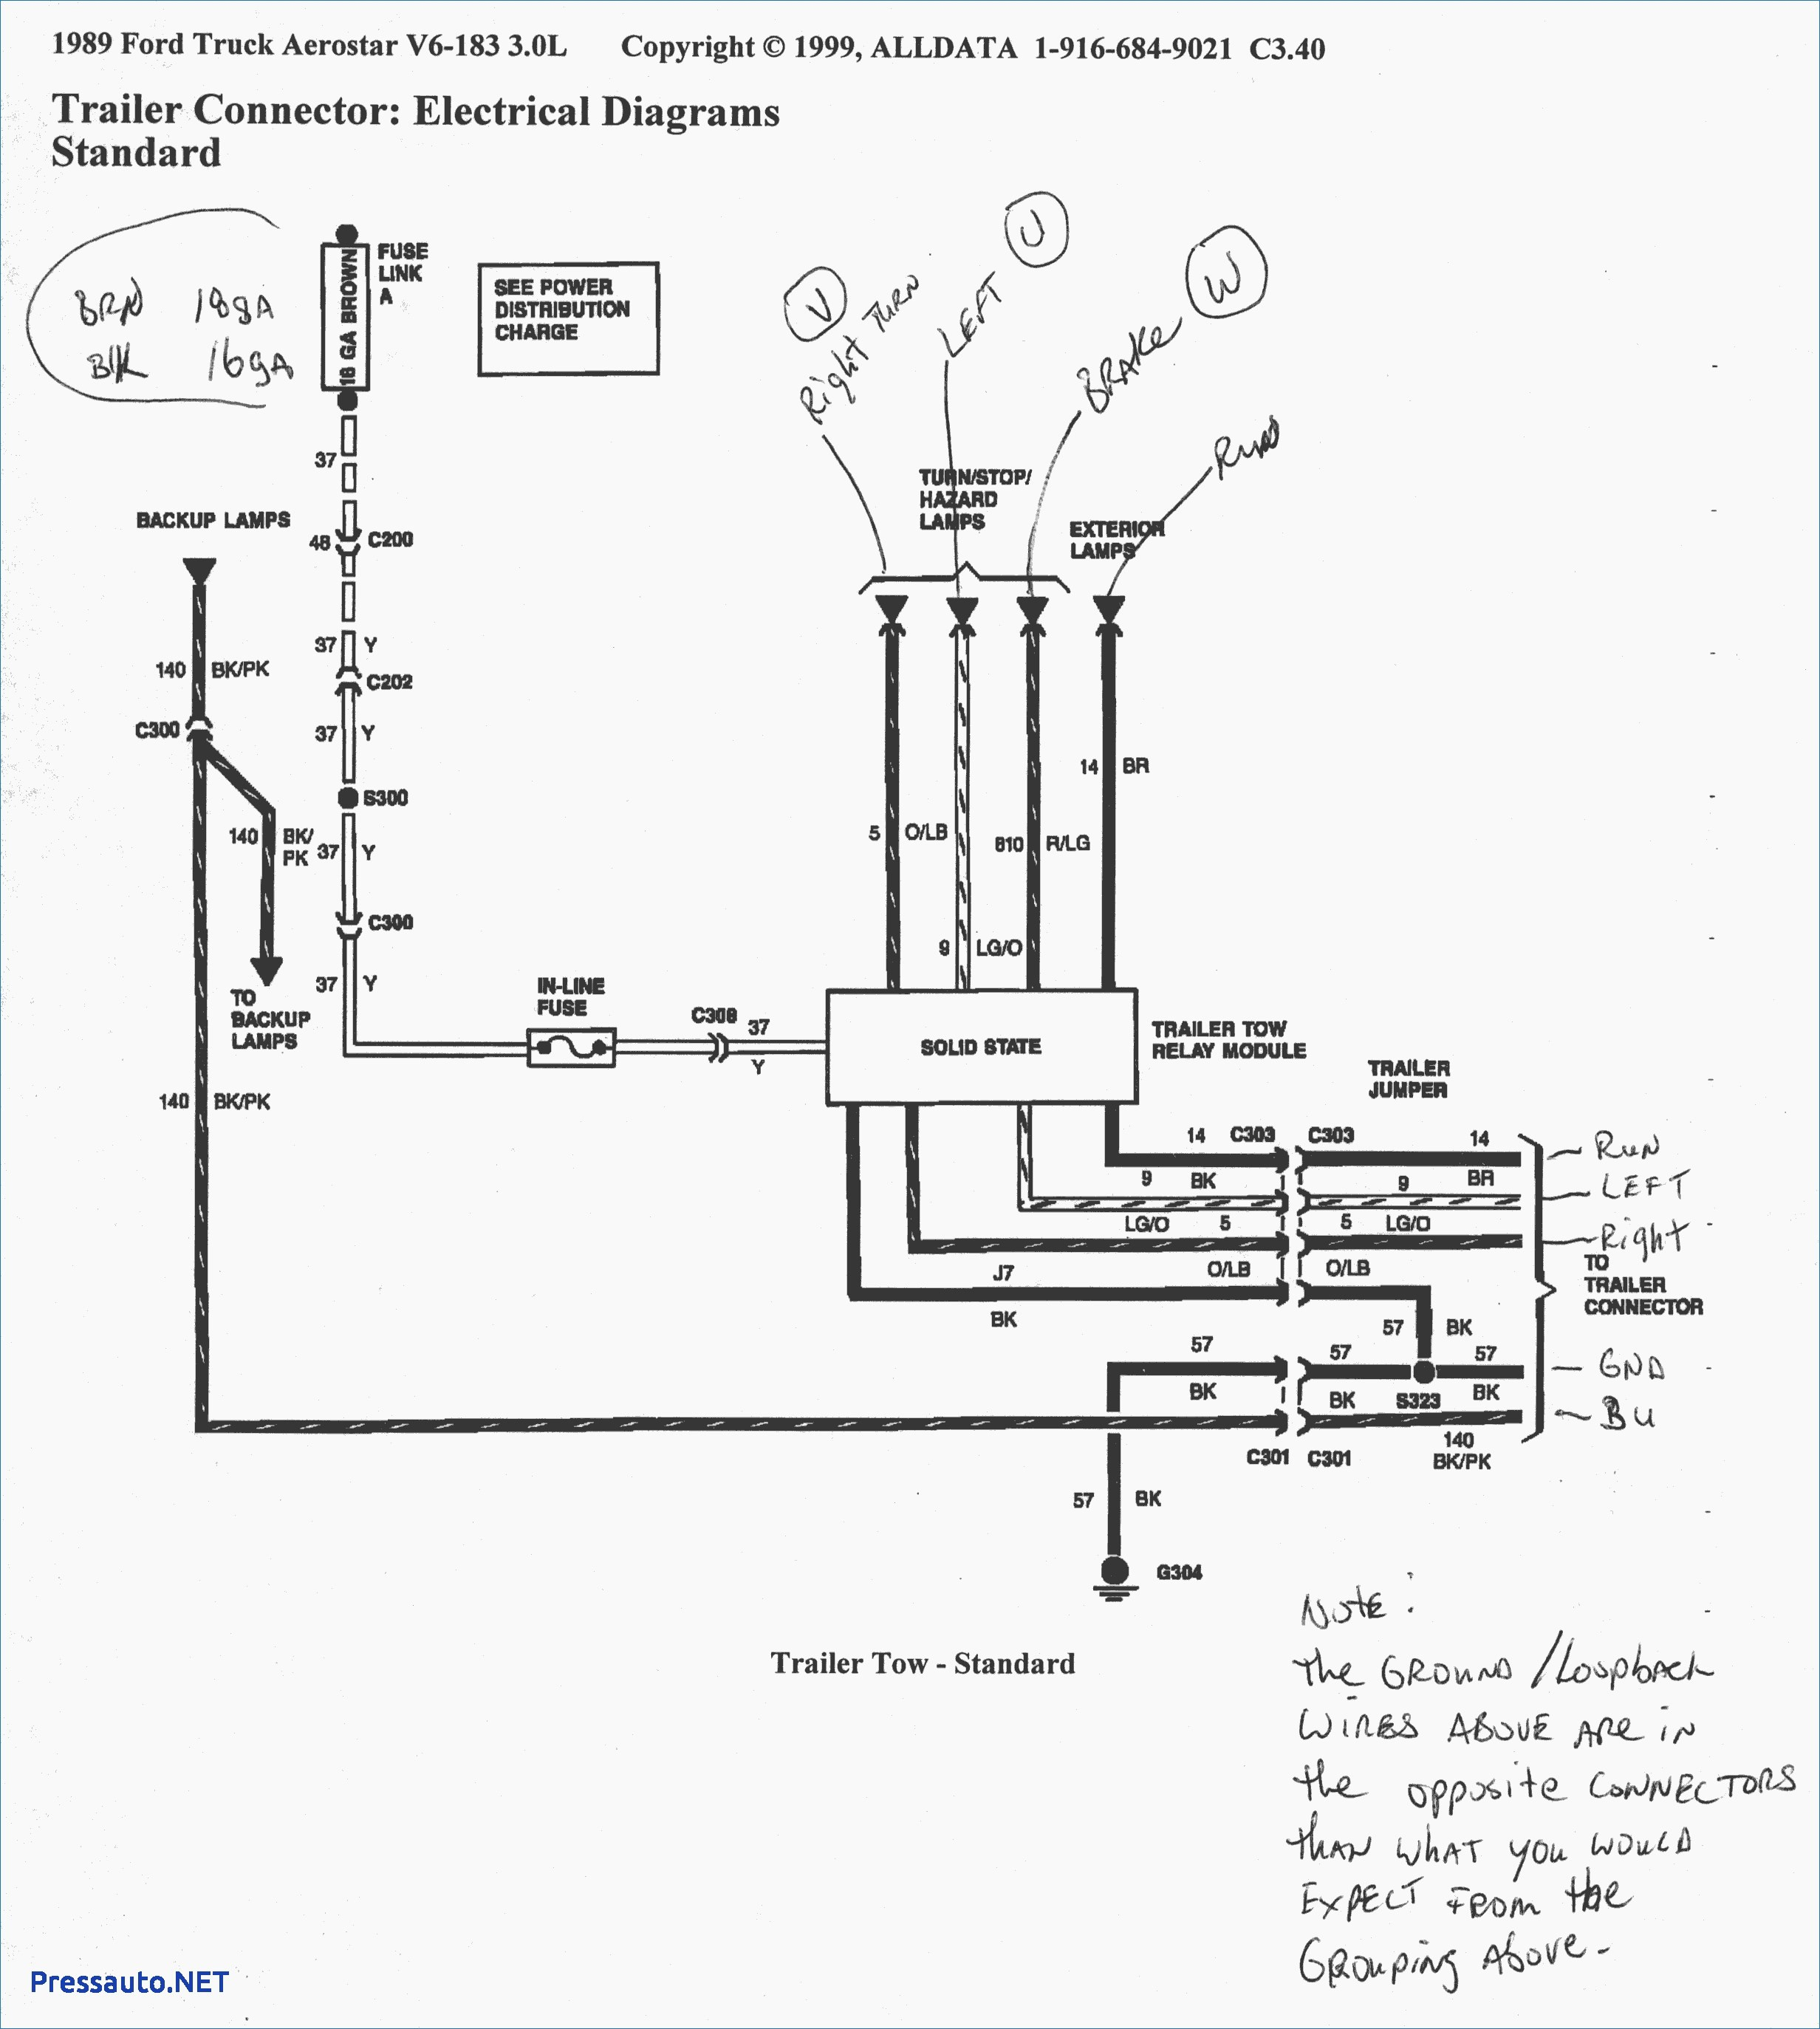 Pickup Trailer Wiring Diagram Download Free Pressauto NET Beautiful